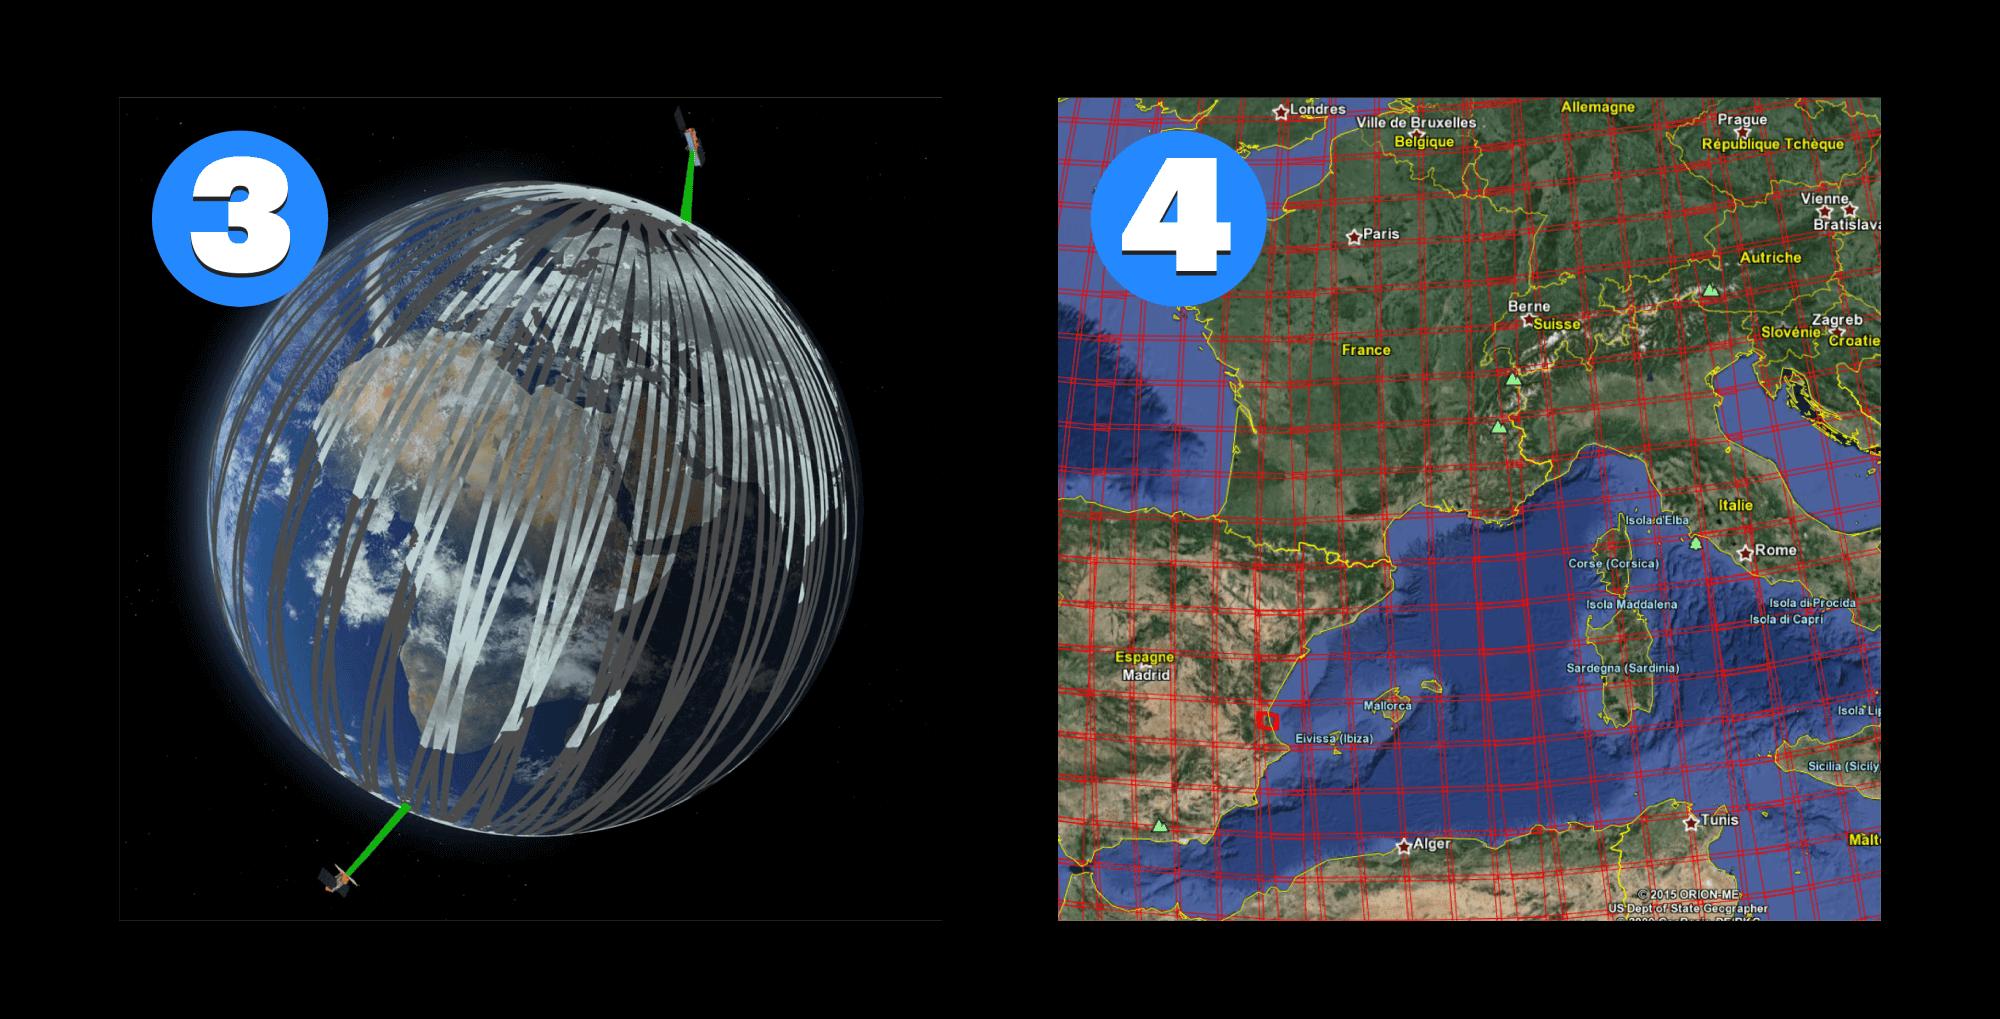 3 — орбиты спутников Sentinel, 4 — сетка снимков Sentinel-2